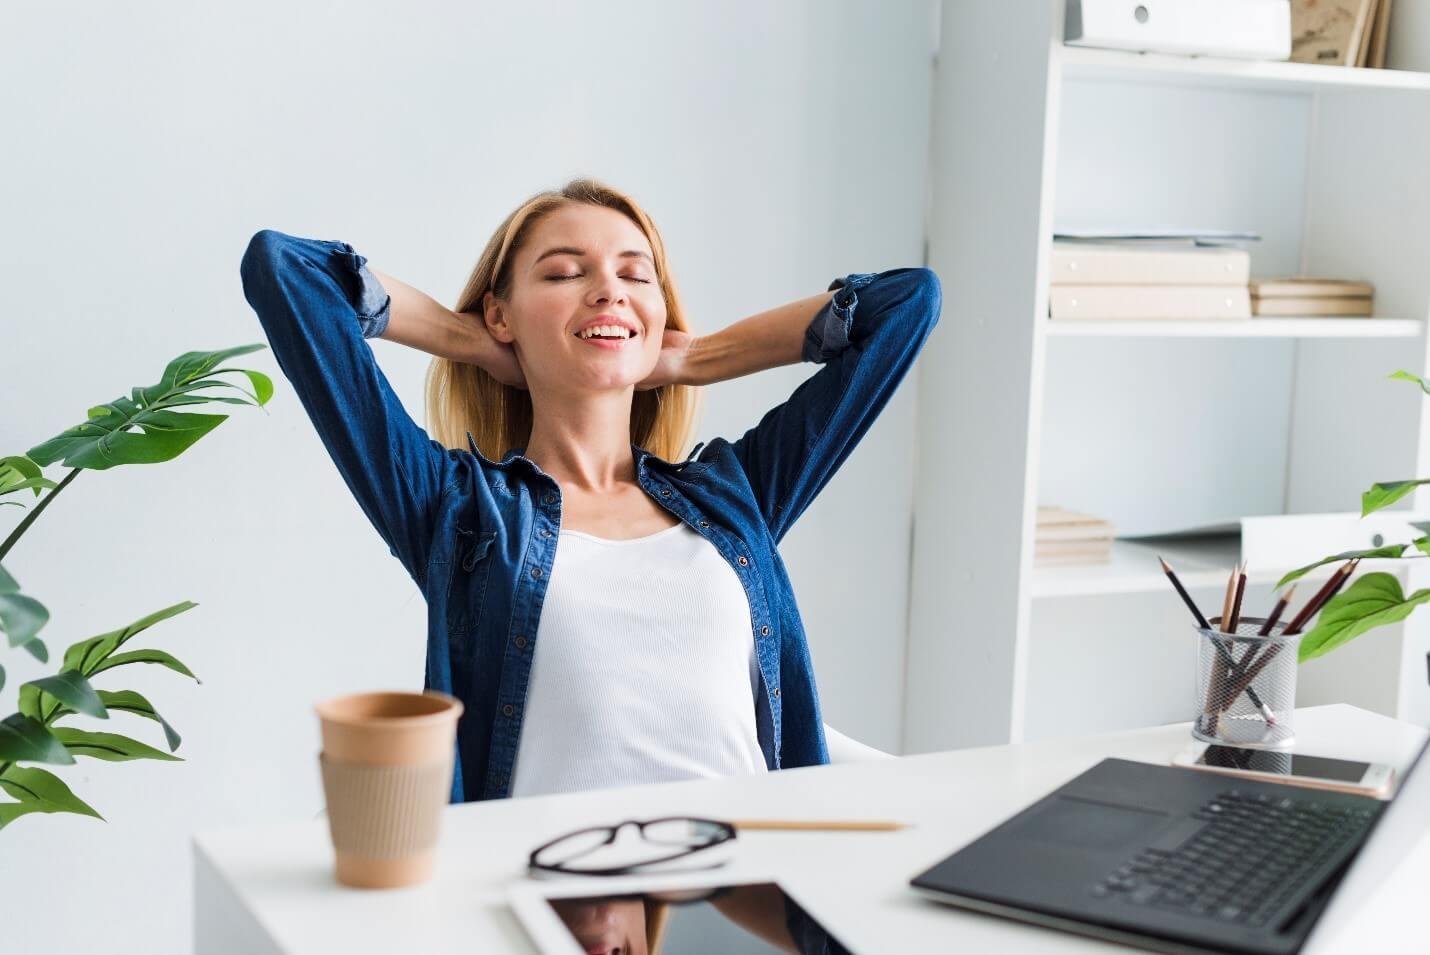 4 Ways to Take Brain-Friendly Breaks